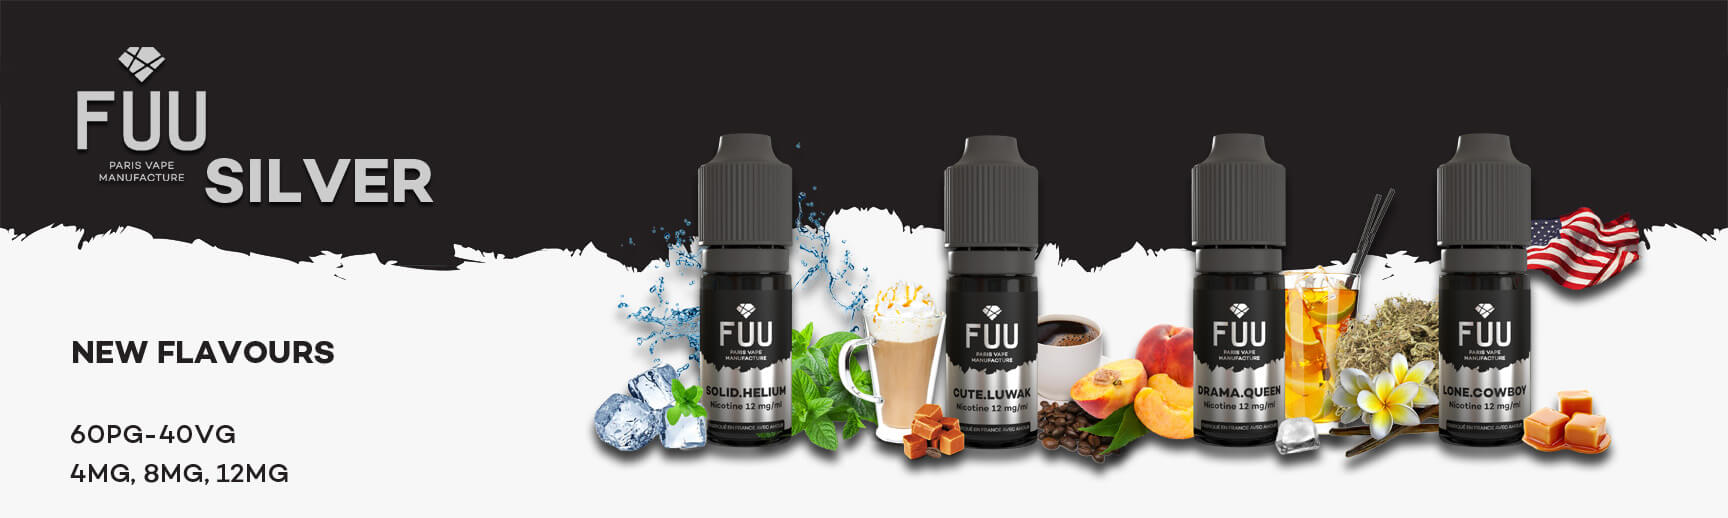 new-fuu-silver-1-.jpeg